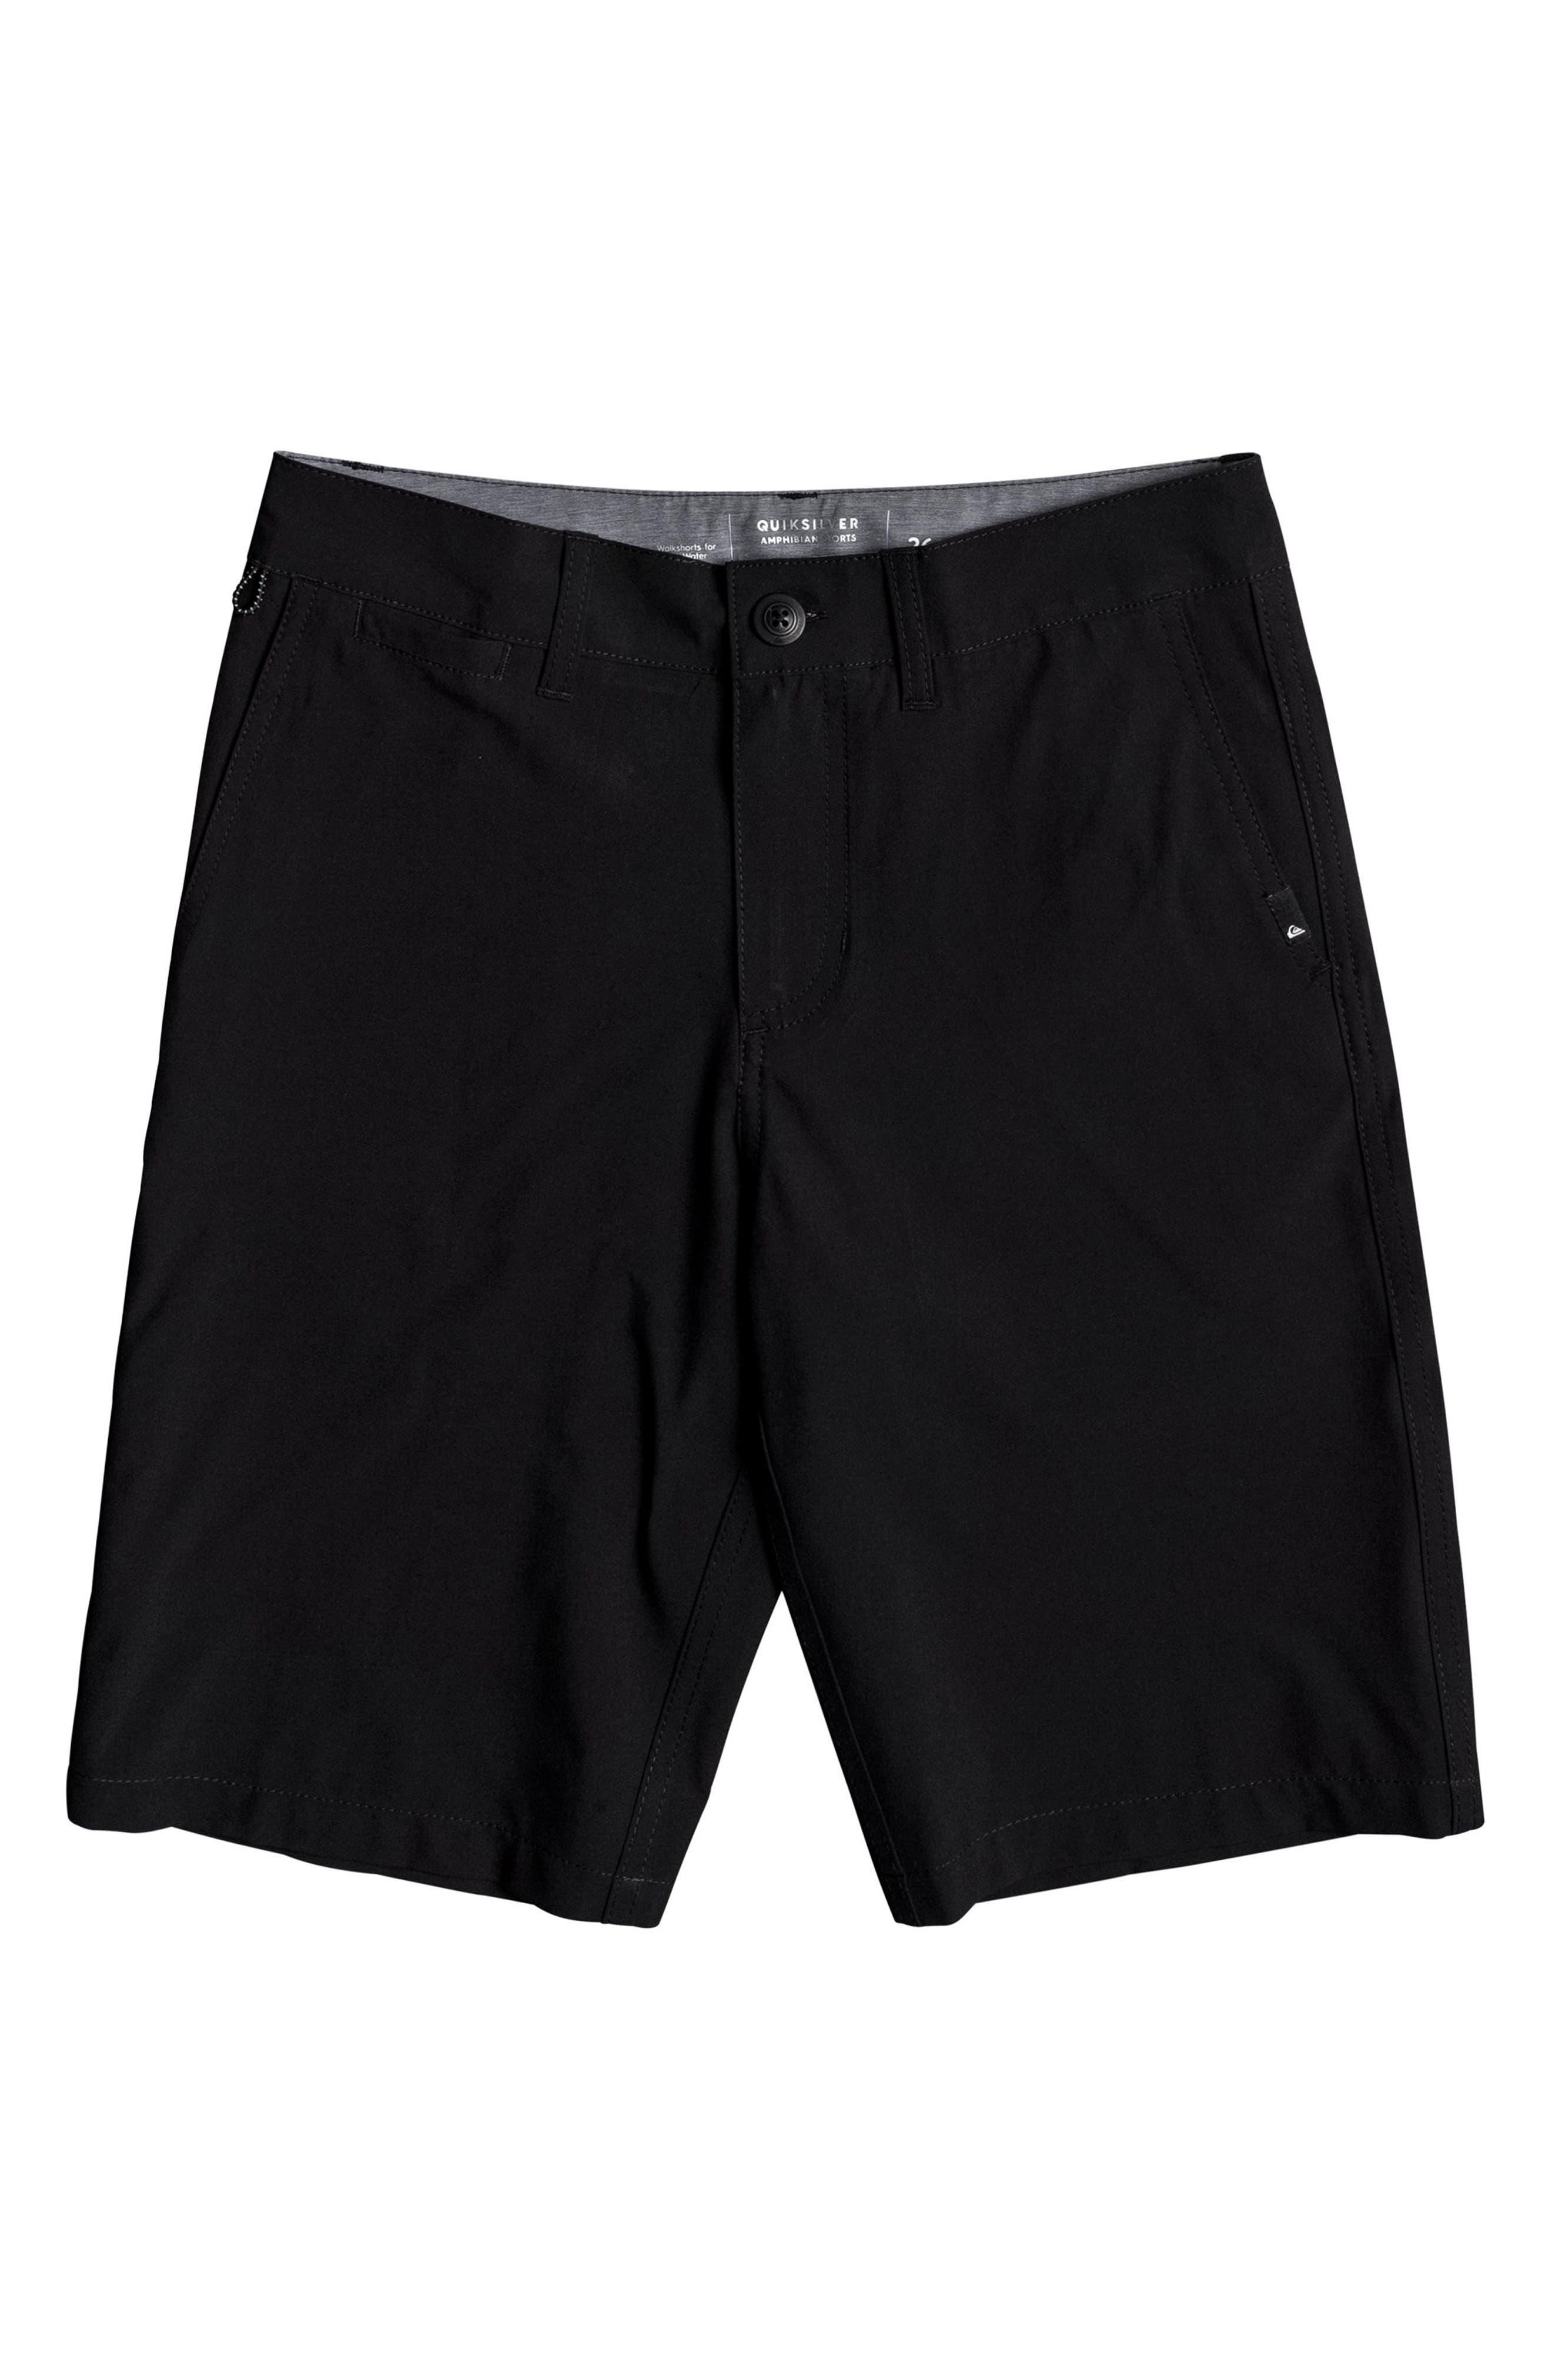 Union Amphibian Board Shorts,                         Main,                         color,